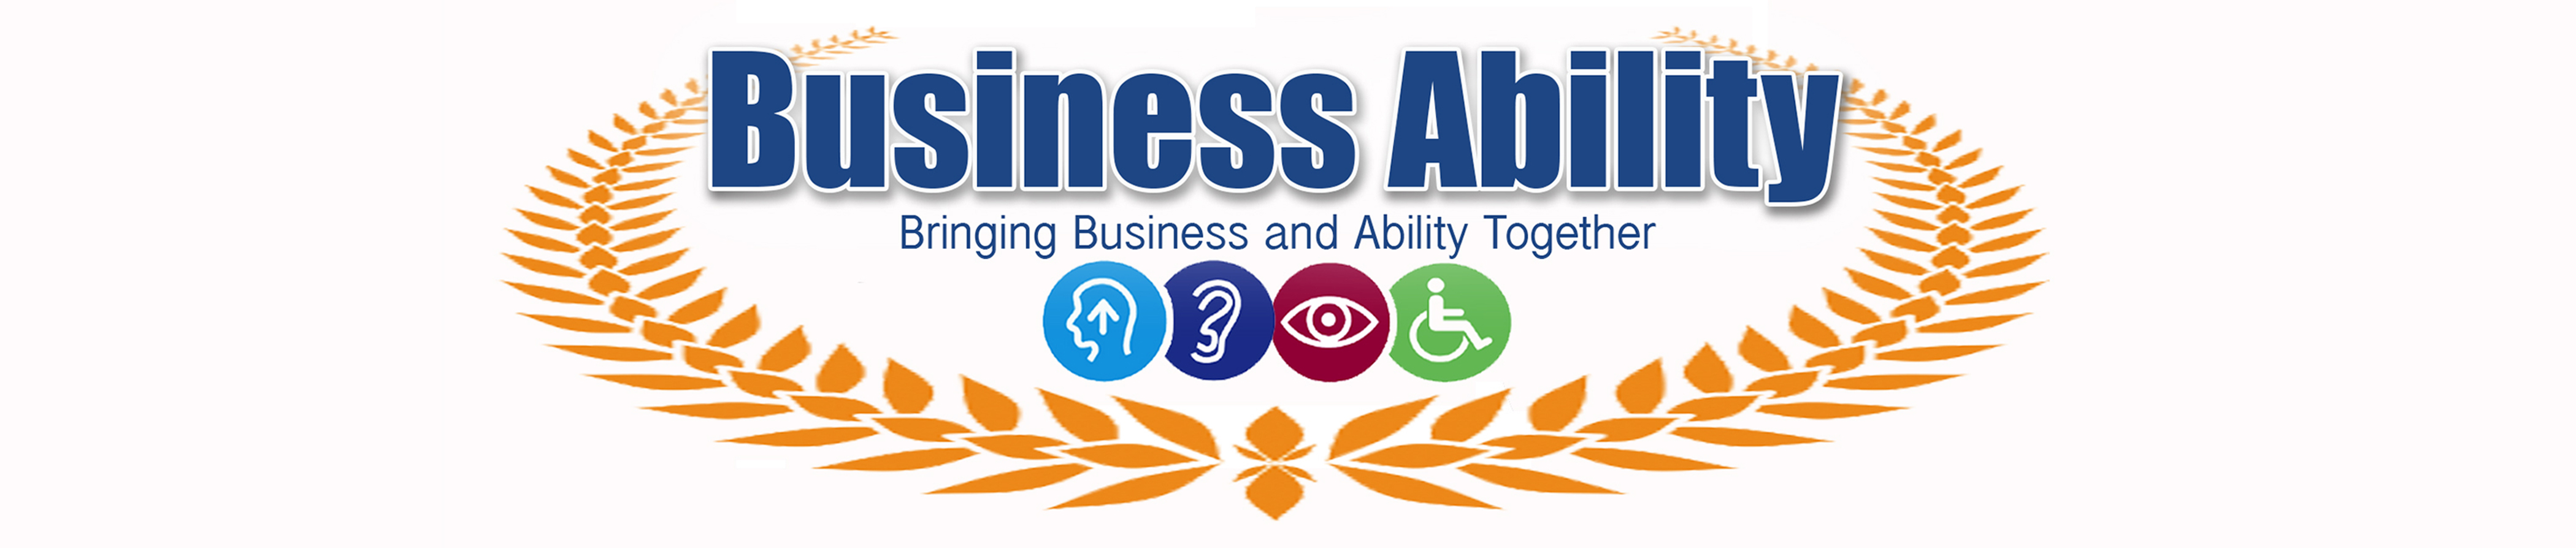 business ability logo